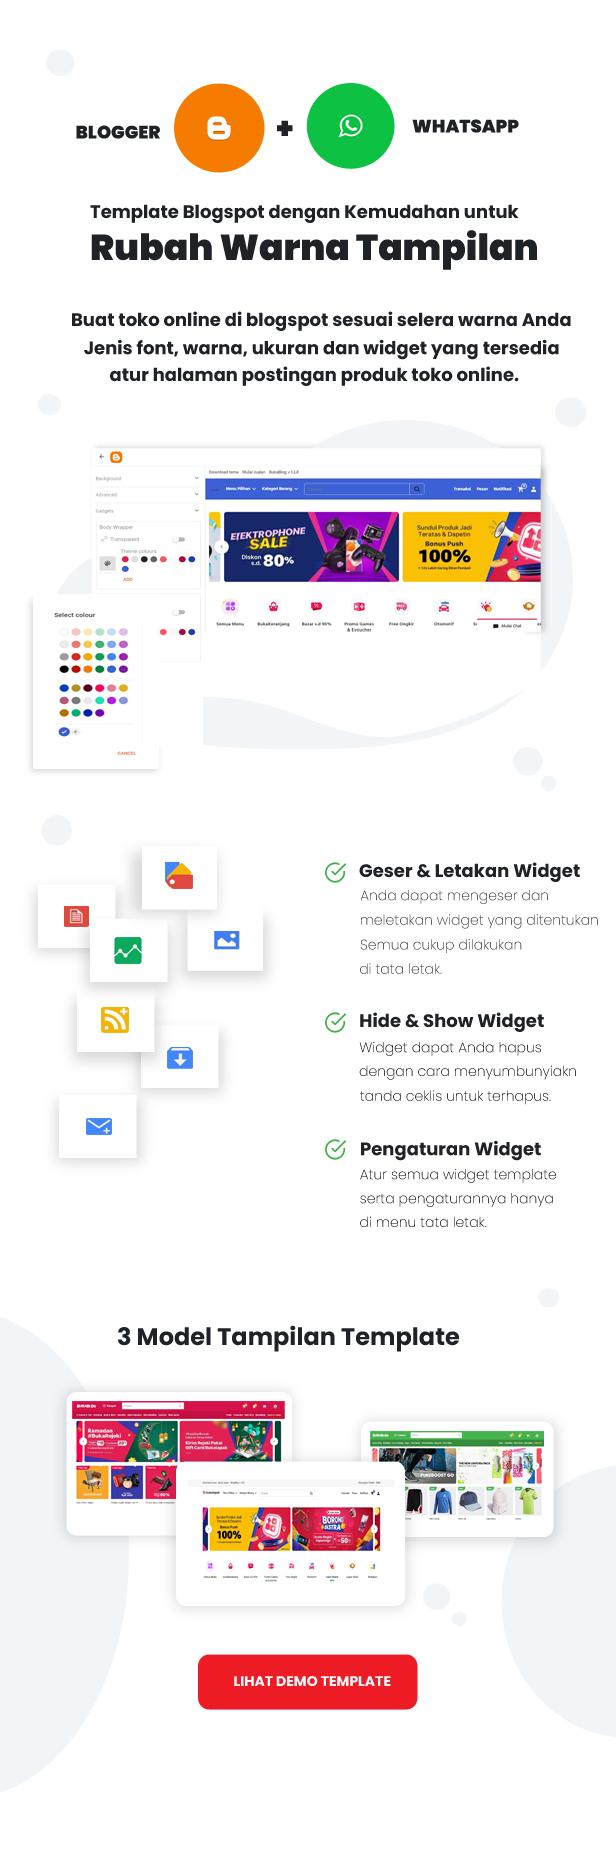 BukaBlog - eCommerce Template Blogger 2021